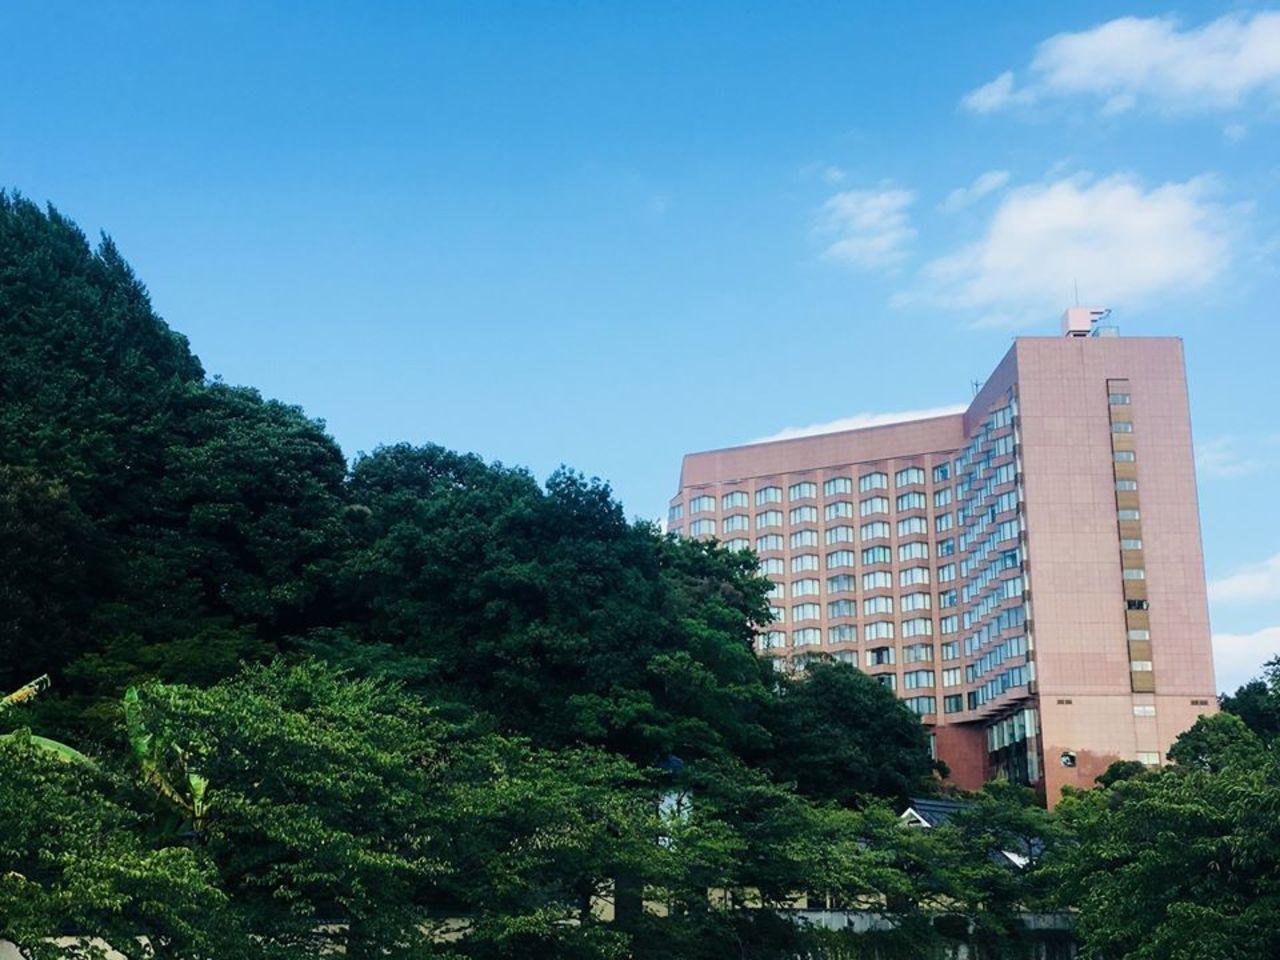 東京都文京区の『ホテル椿山荘東京』